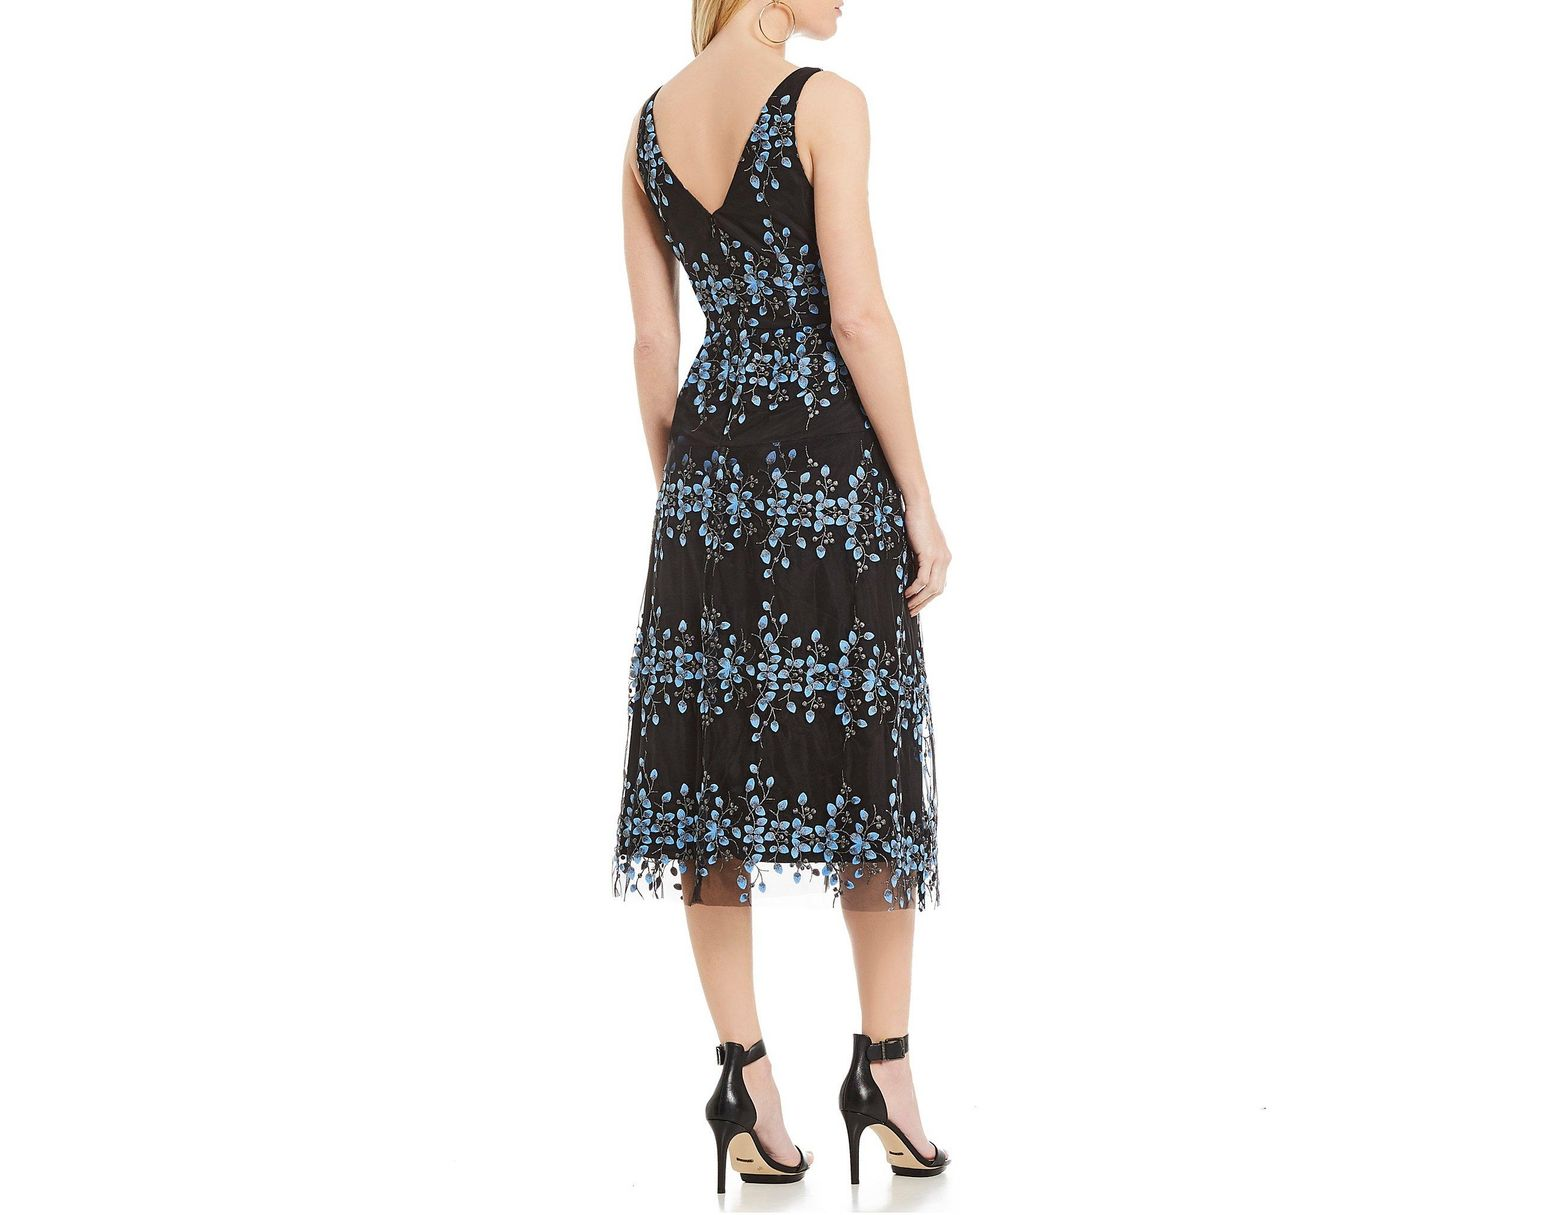 e371f7b8224 Gianni Bini Emily Embroidered Midi Dress in Black - Save 42% - Lyst